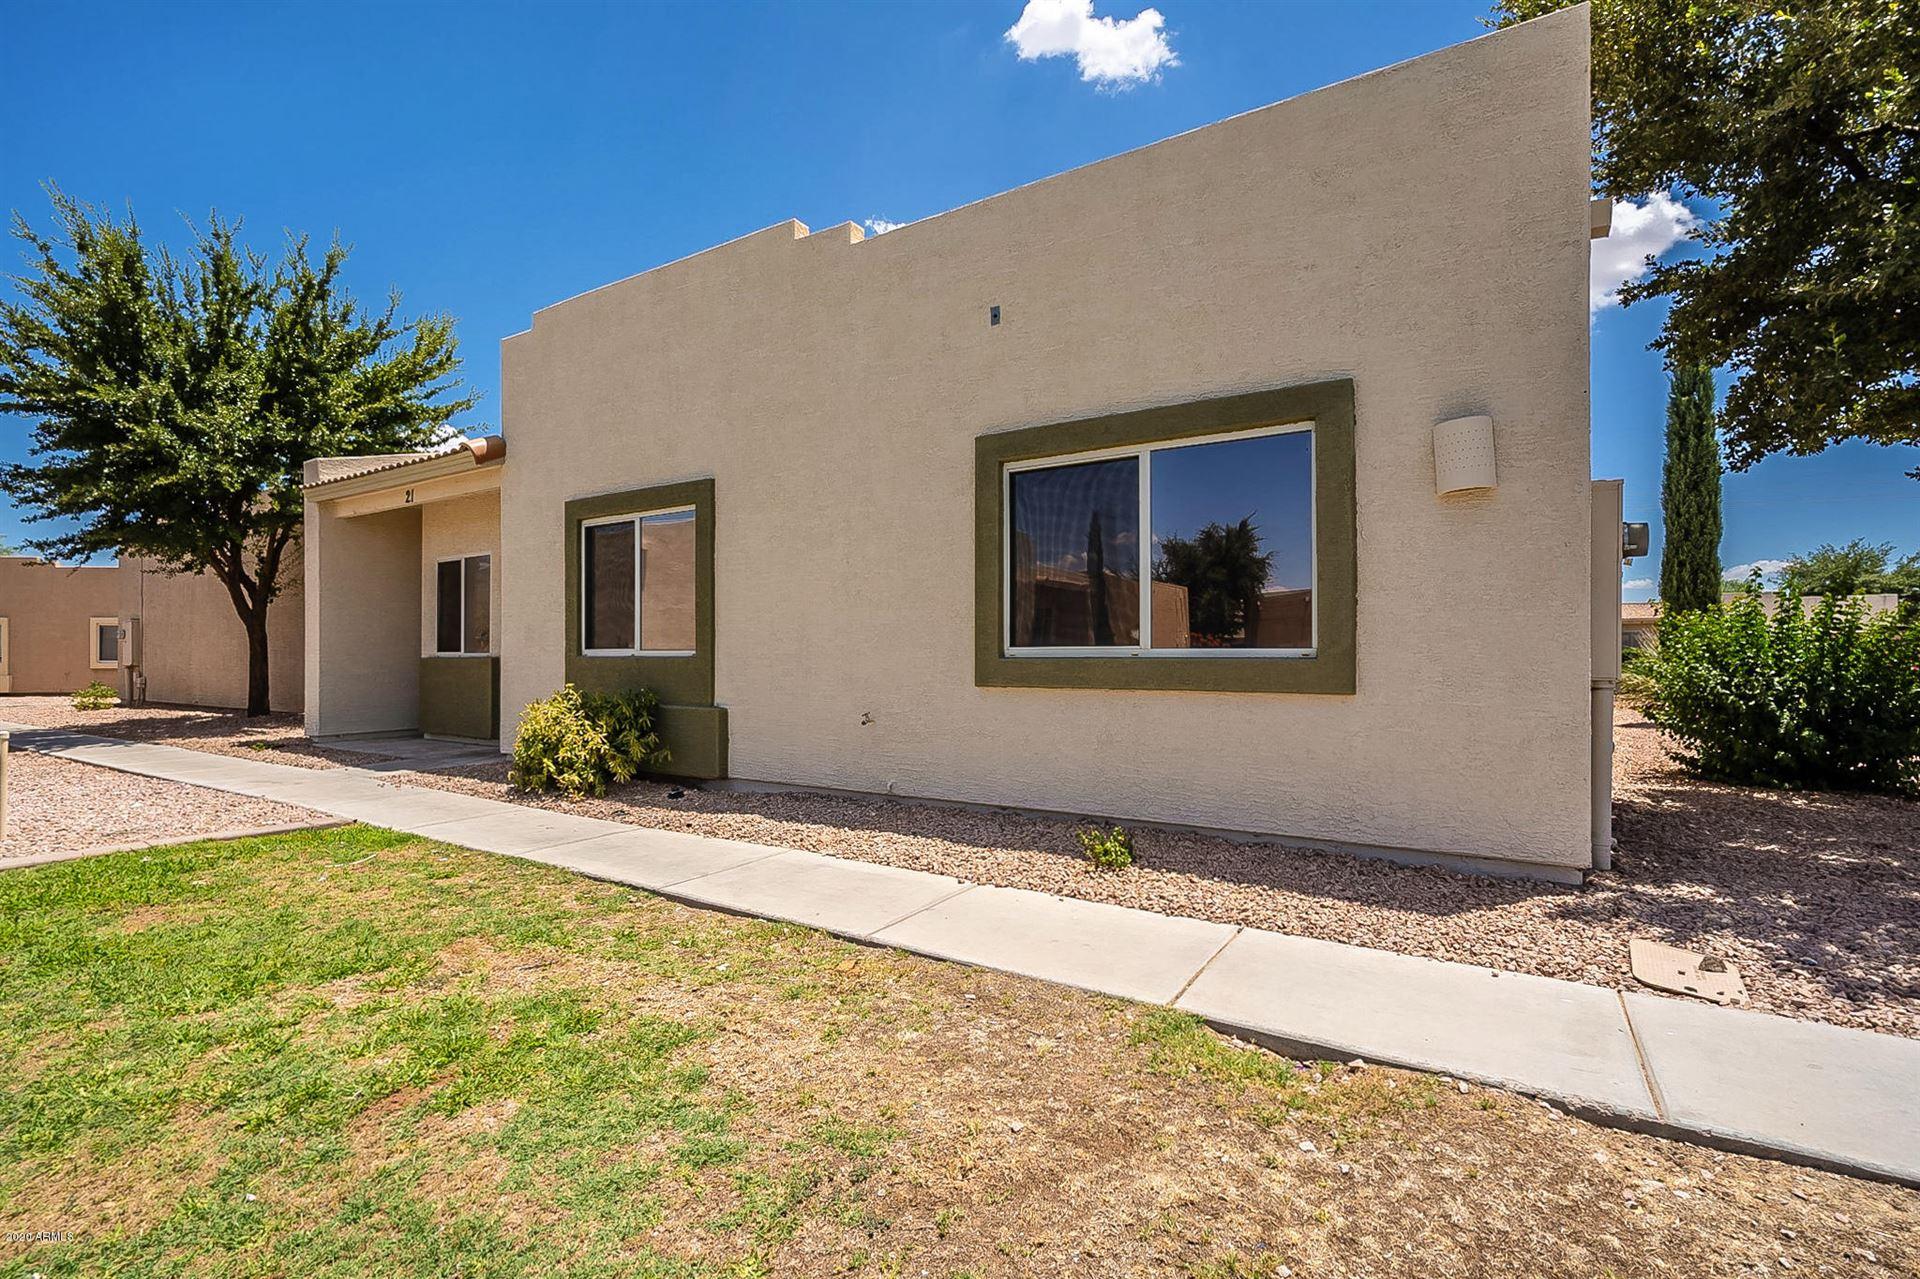 2300 E MAGMA Road #21, San Tan Valley, AZ 85143 - #: 6099358